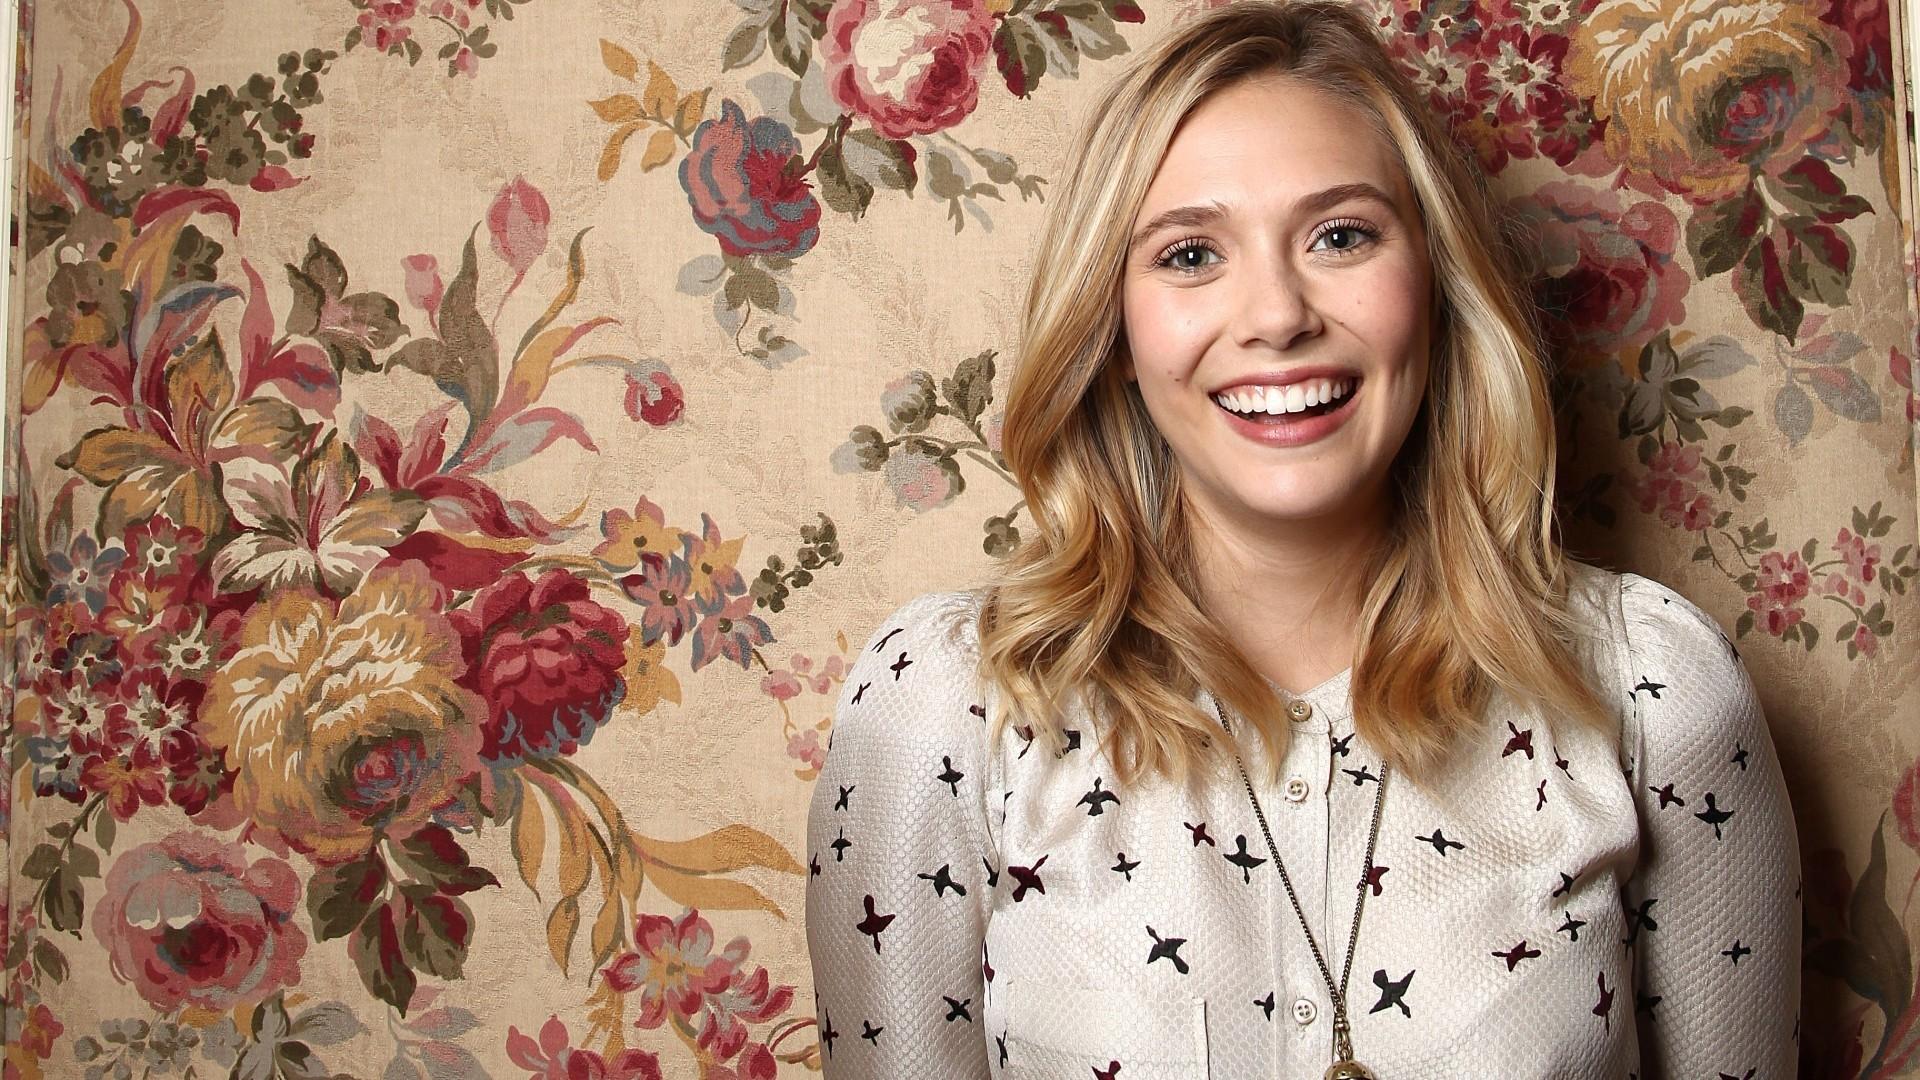 Elizabeth Olsen Full HD Wallpaper